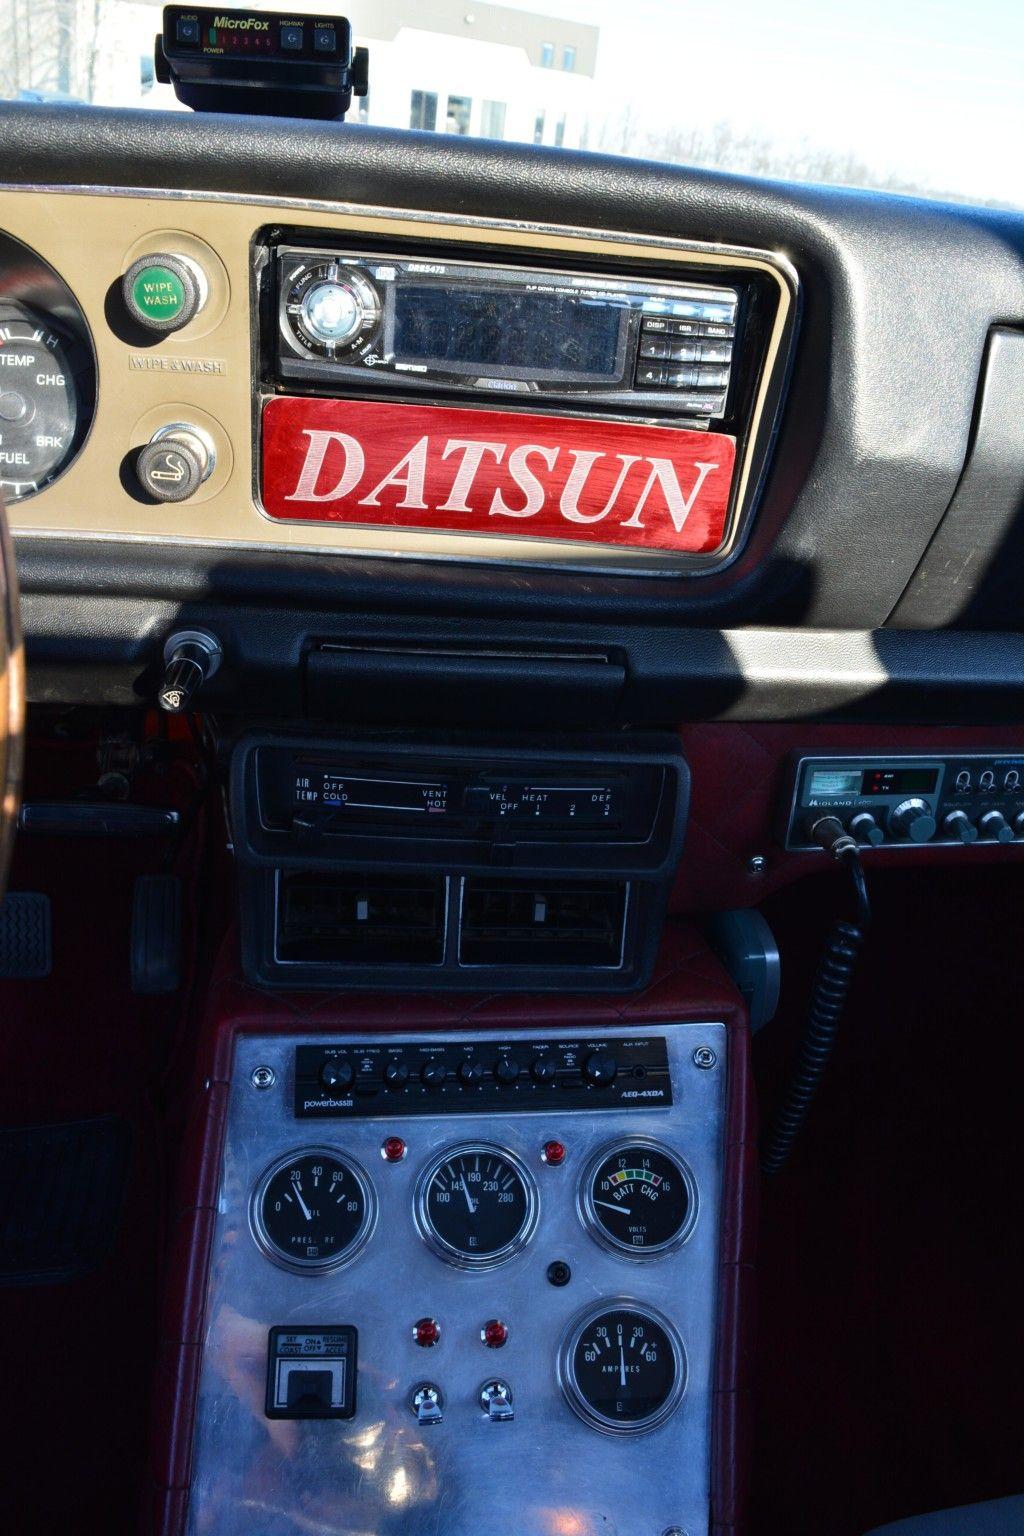 1974 Datsun 620 Pickup Pickup Trucks Datsun Ford Pickup Trucks